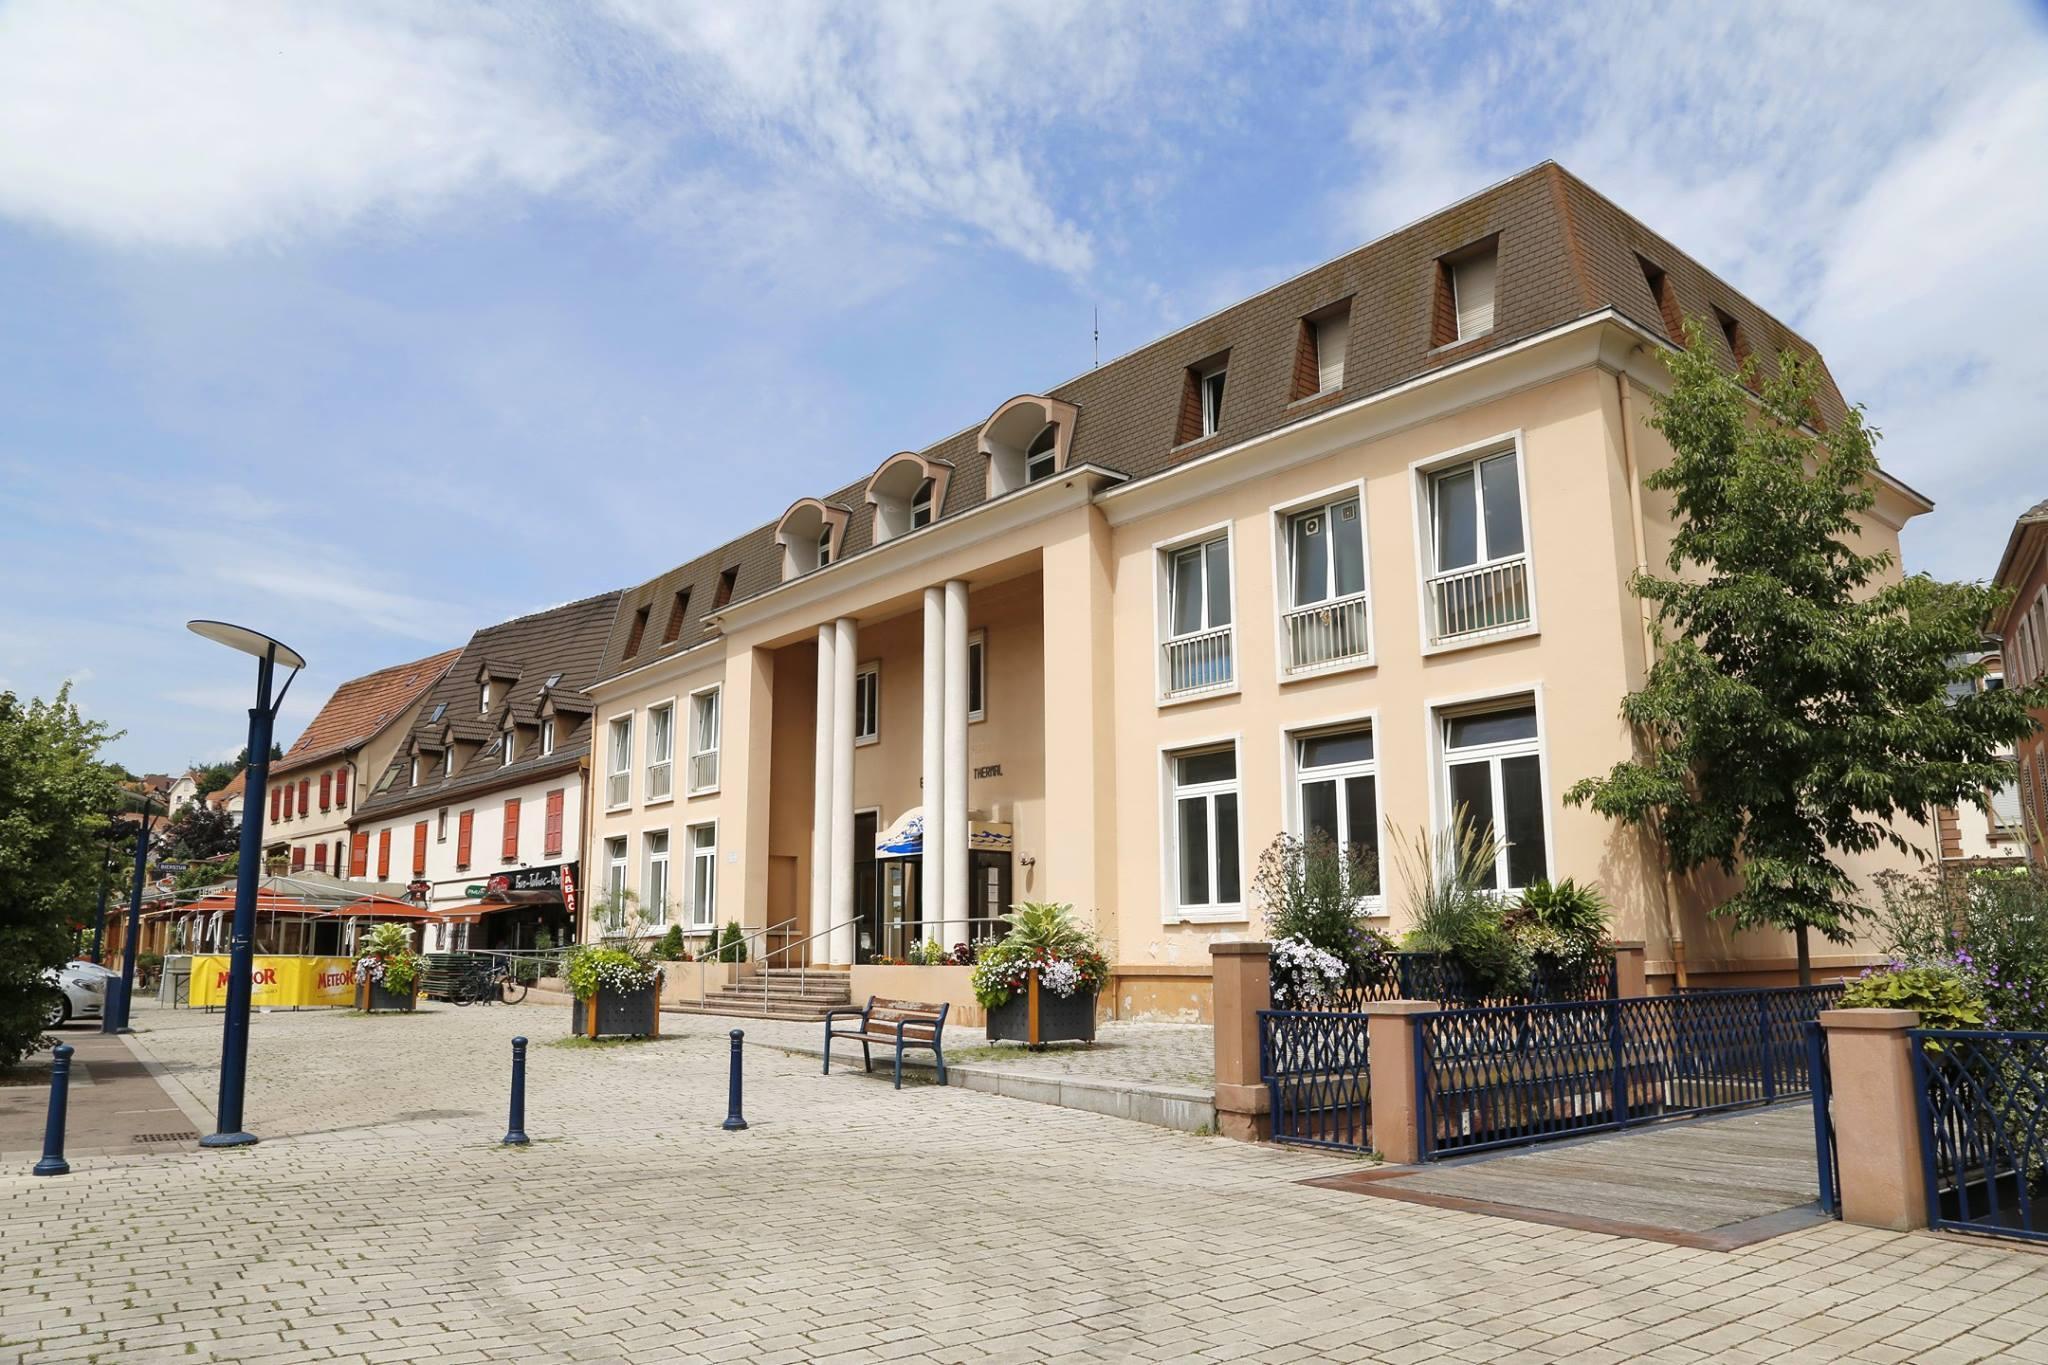 1569-67-thermes-de-niederbronn.jpg